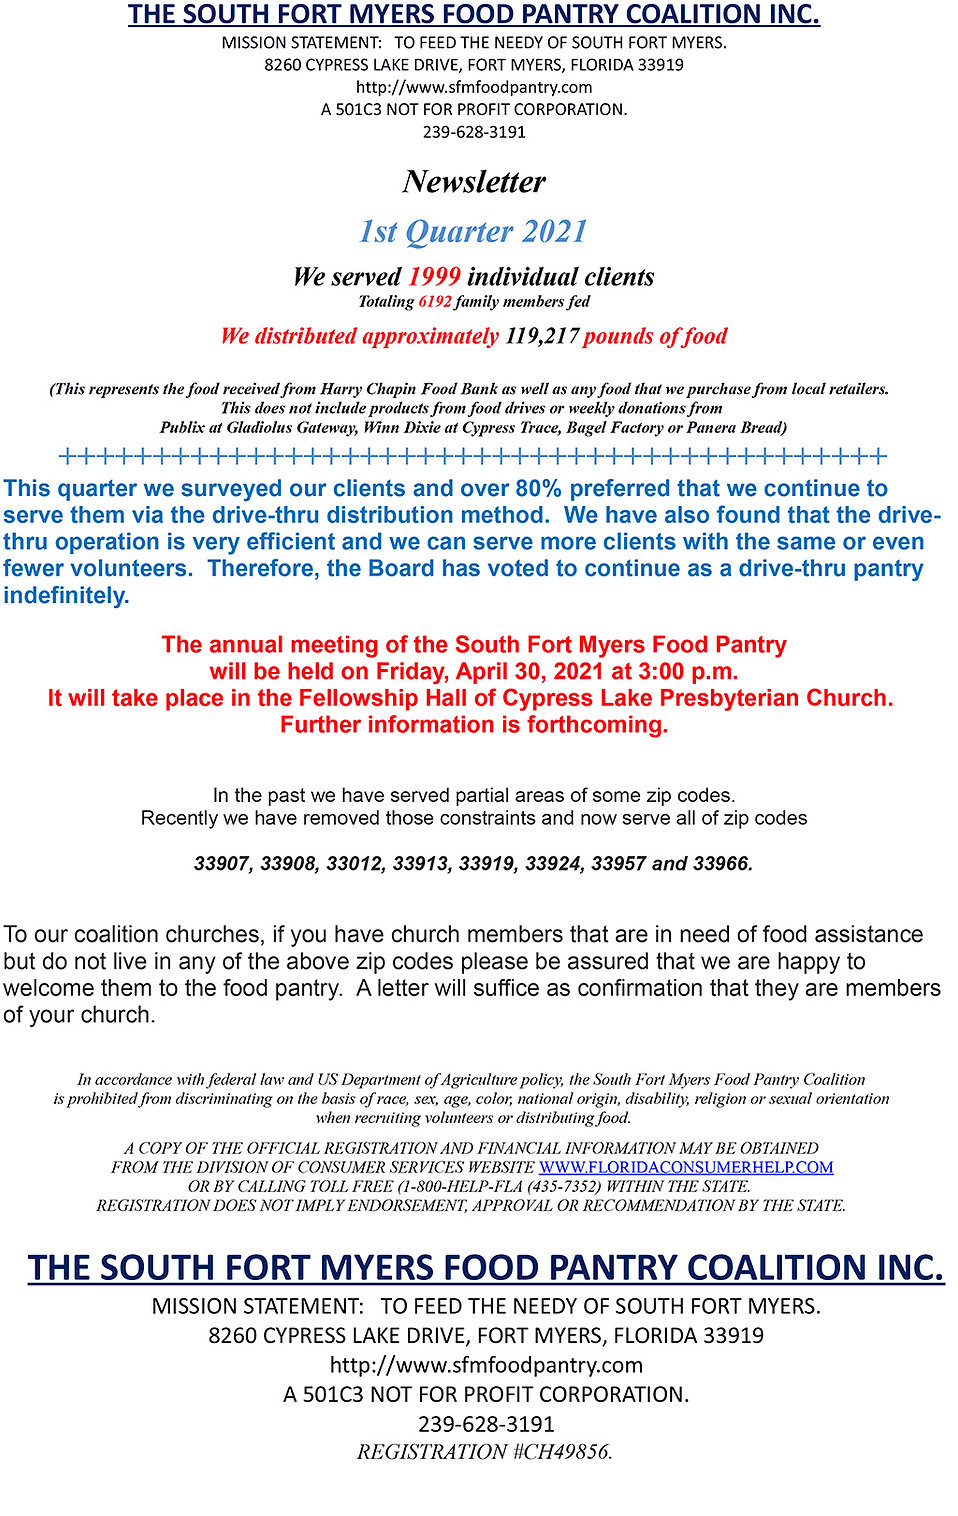 2021 1st Qtr Newsletter-1.jpg